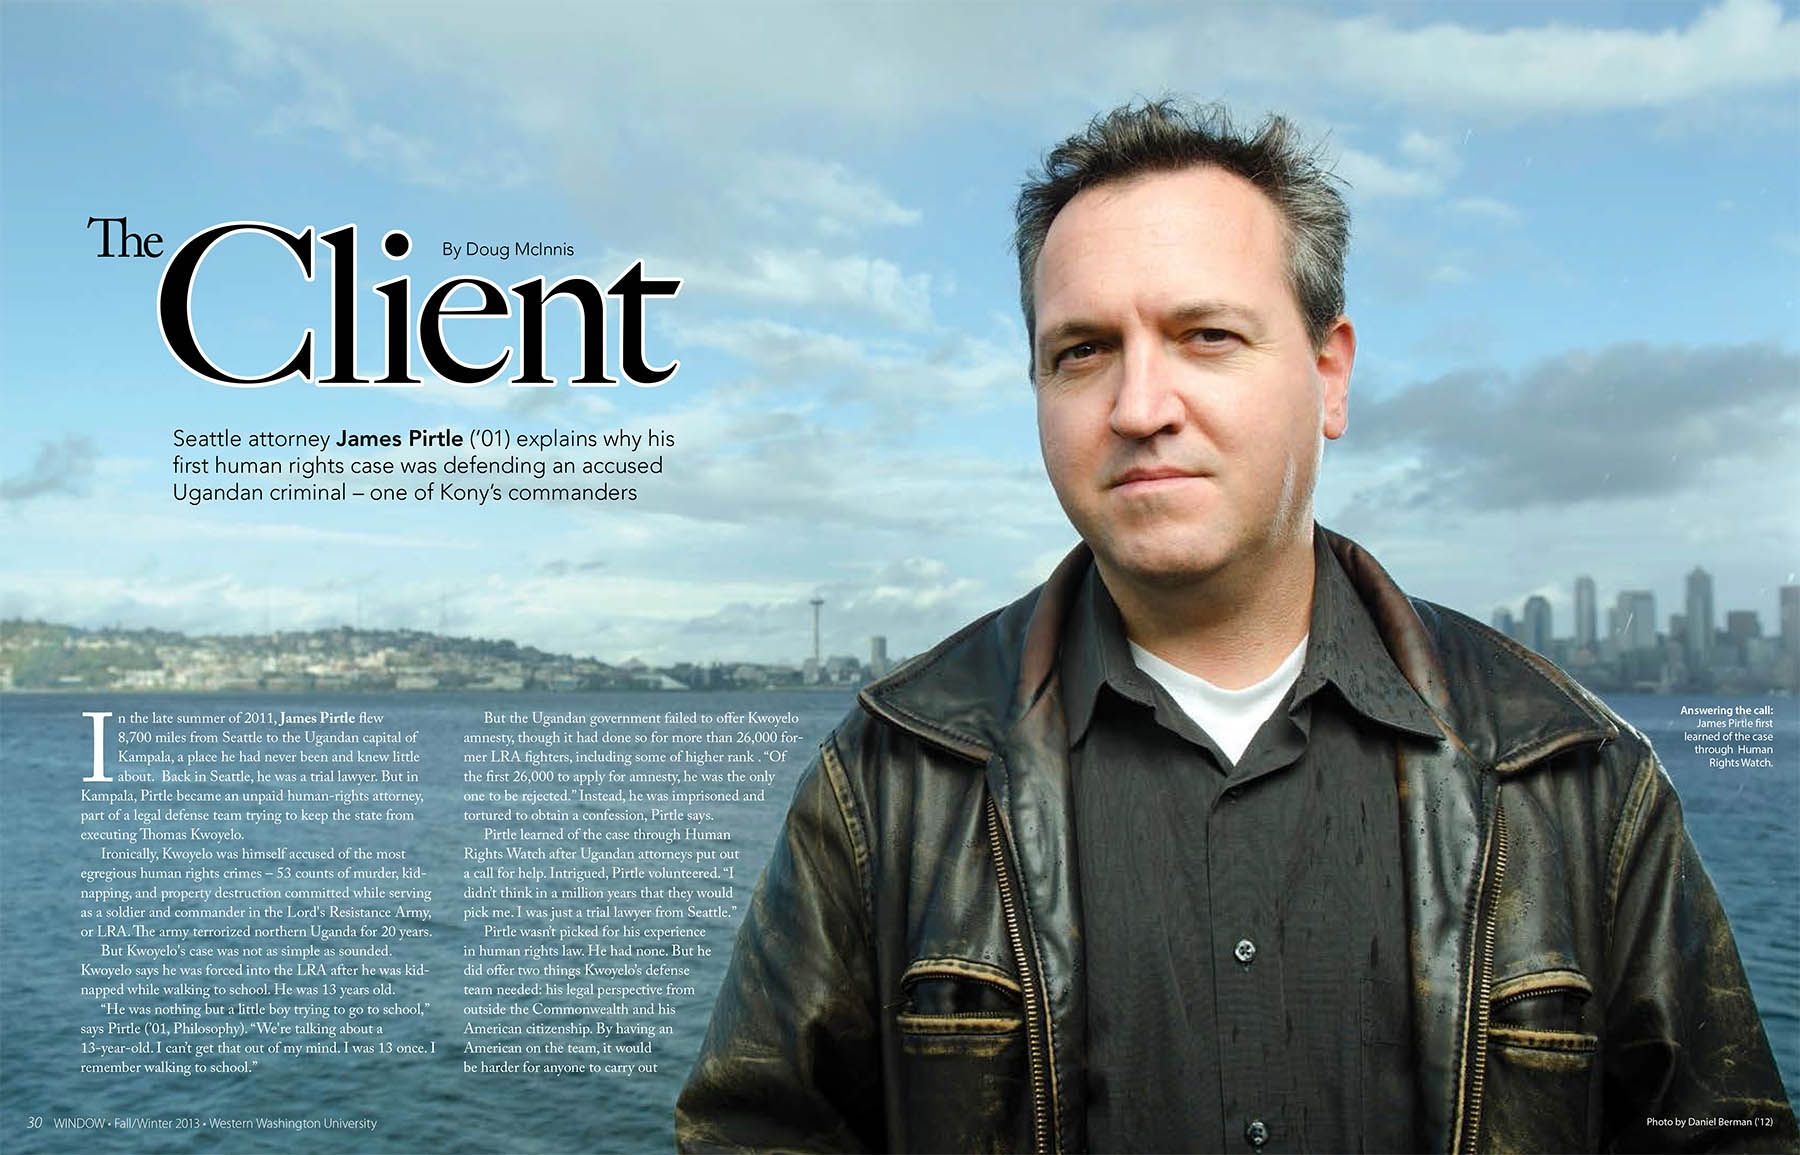 Seattle editorial photographer